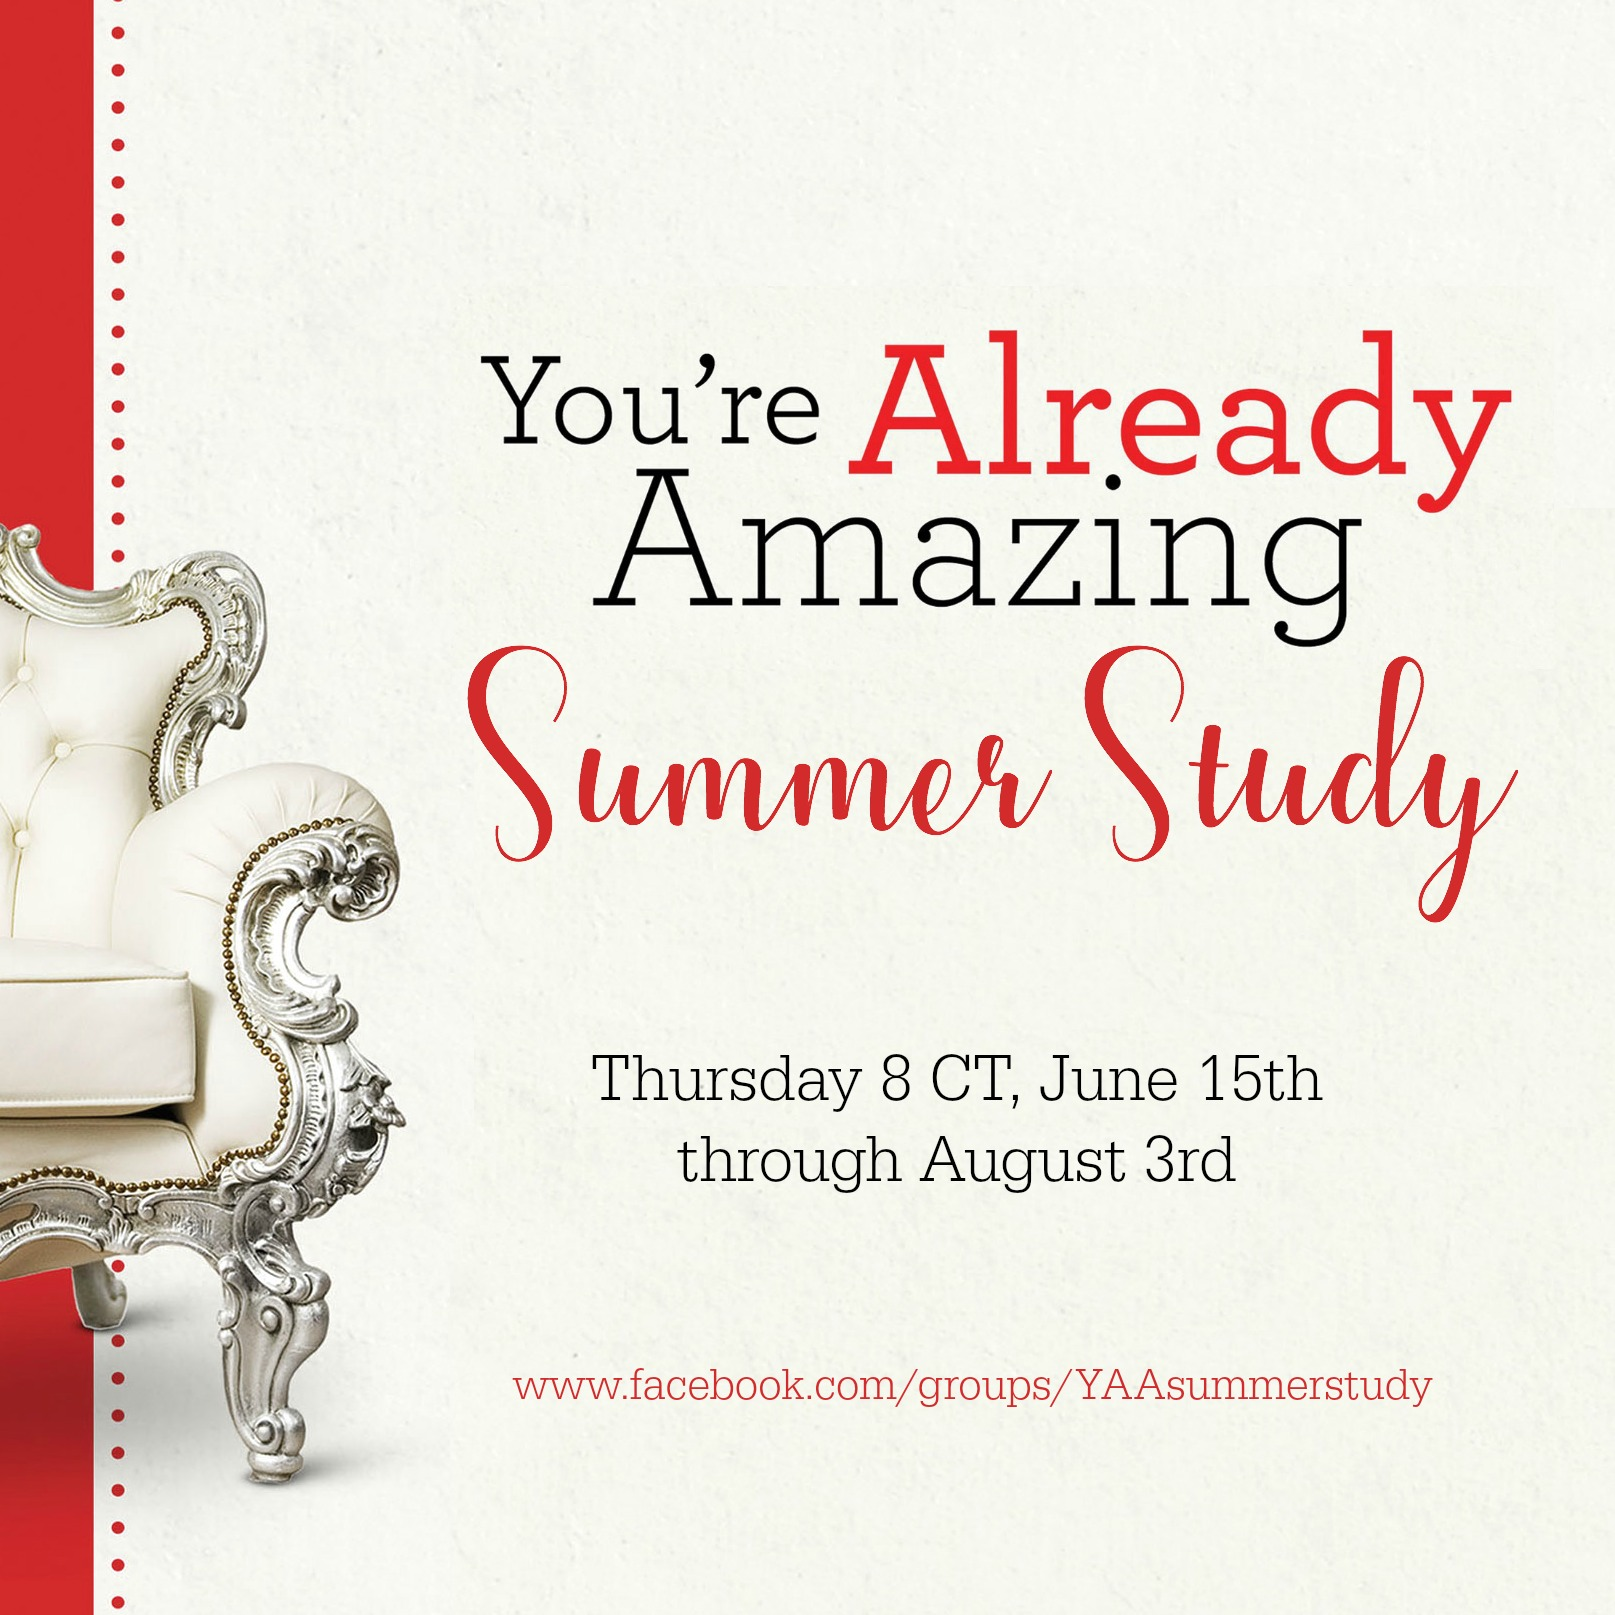 Invitation: You're Already Amazing Summer Study